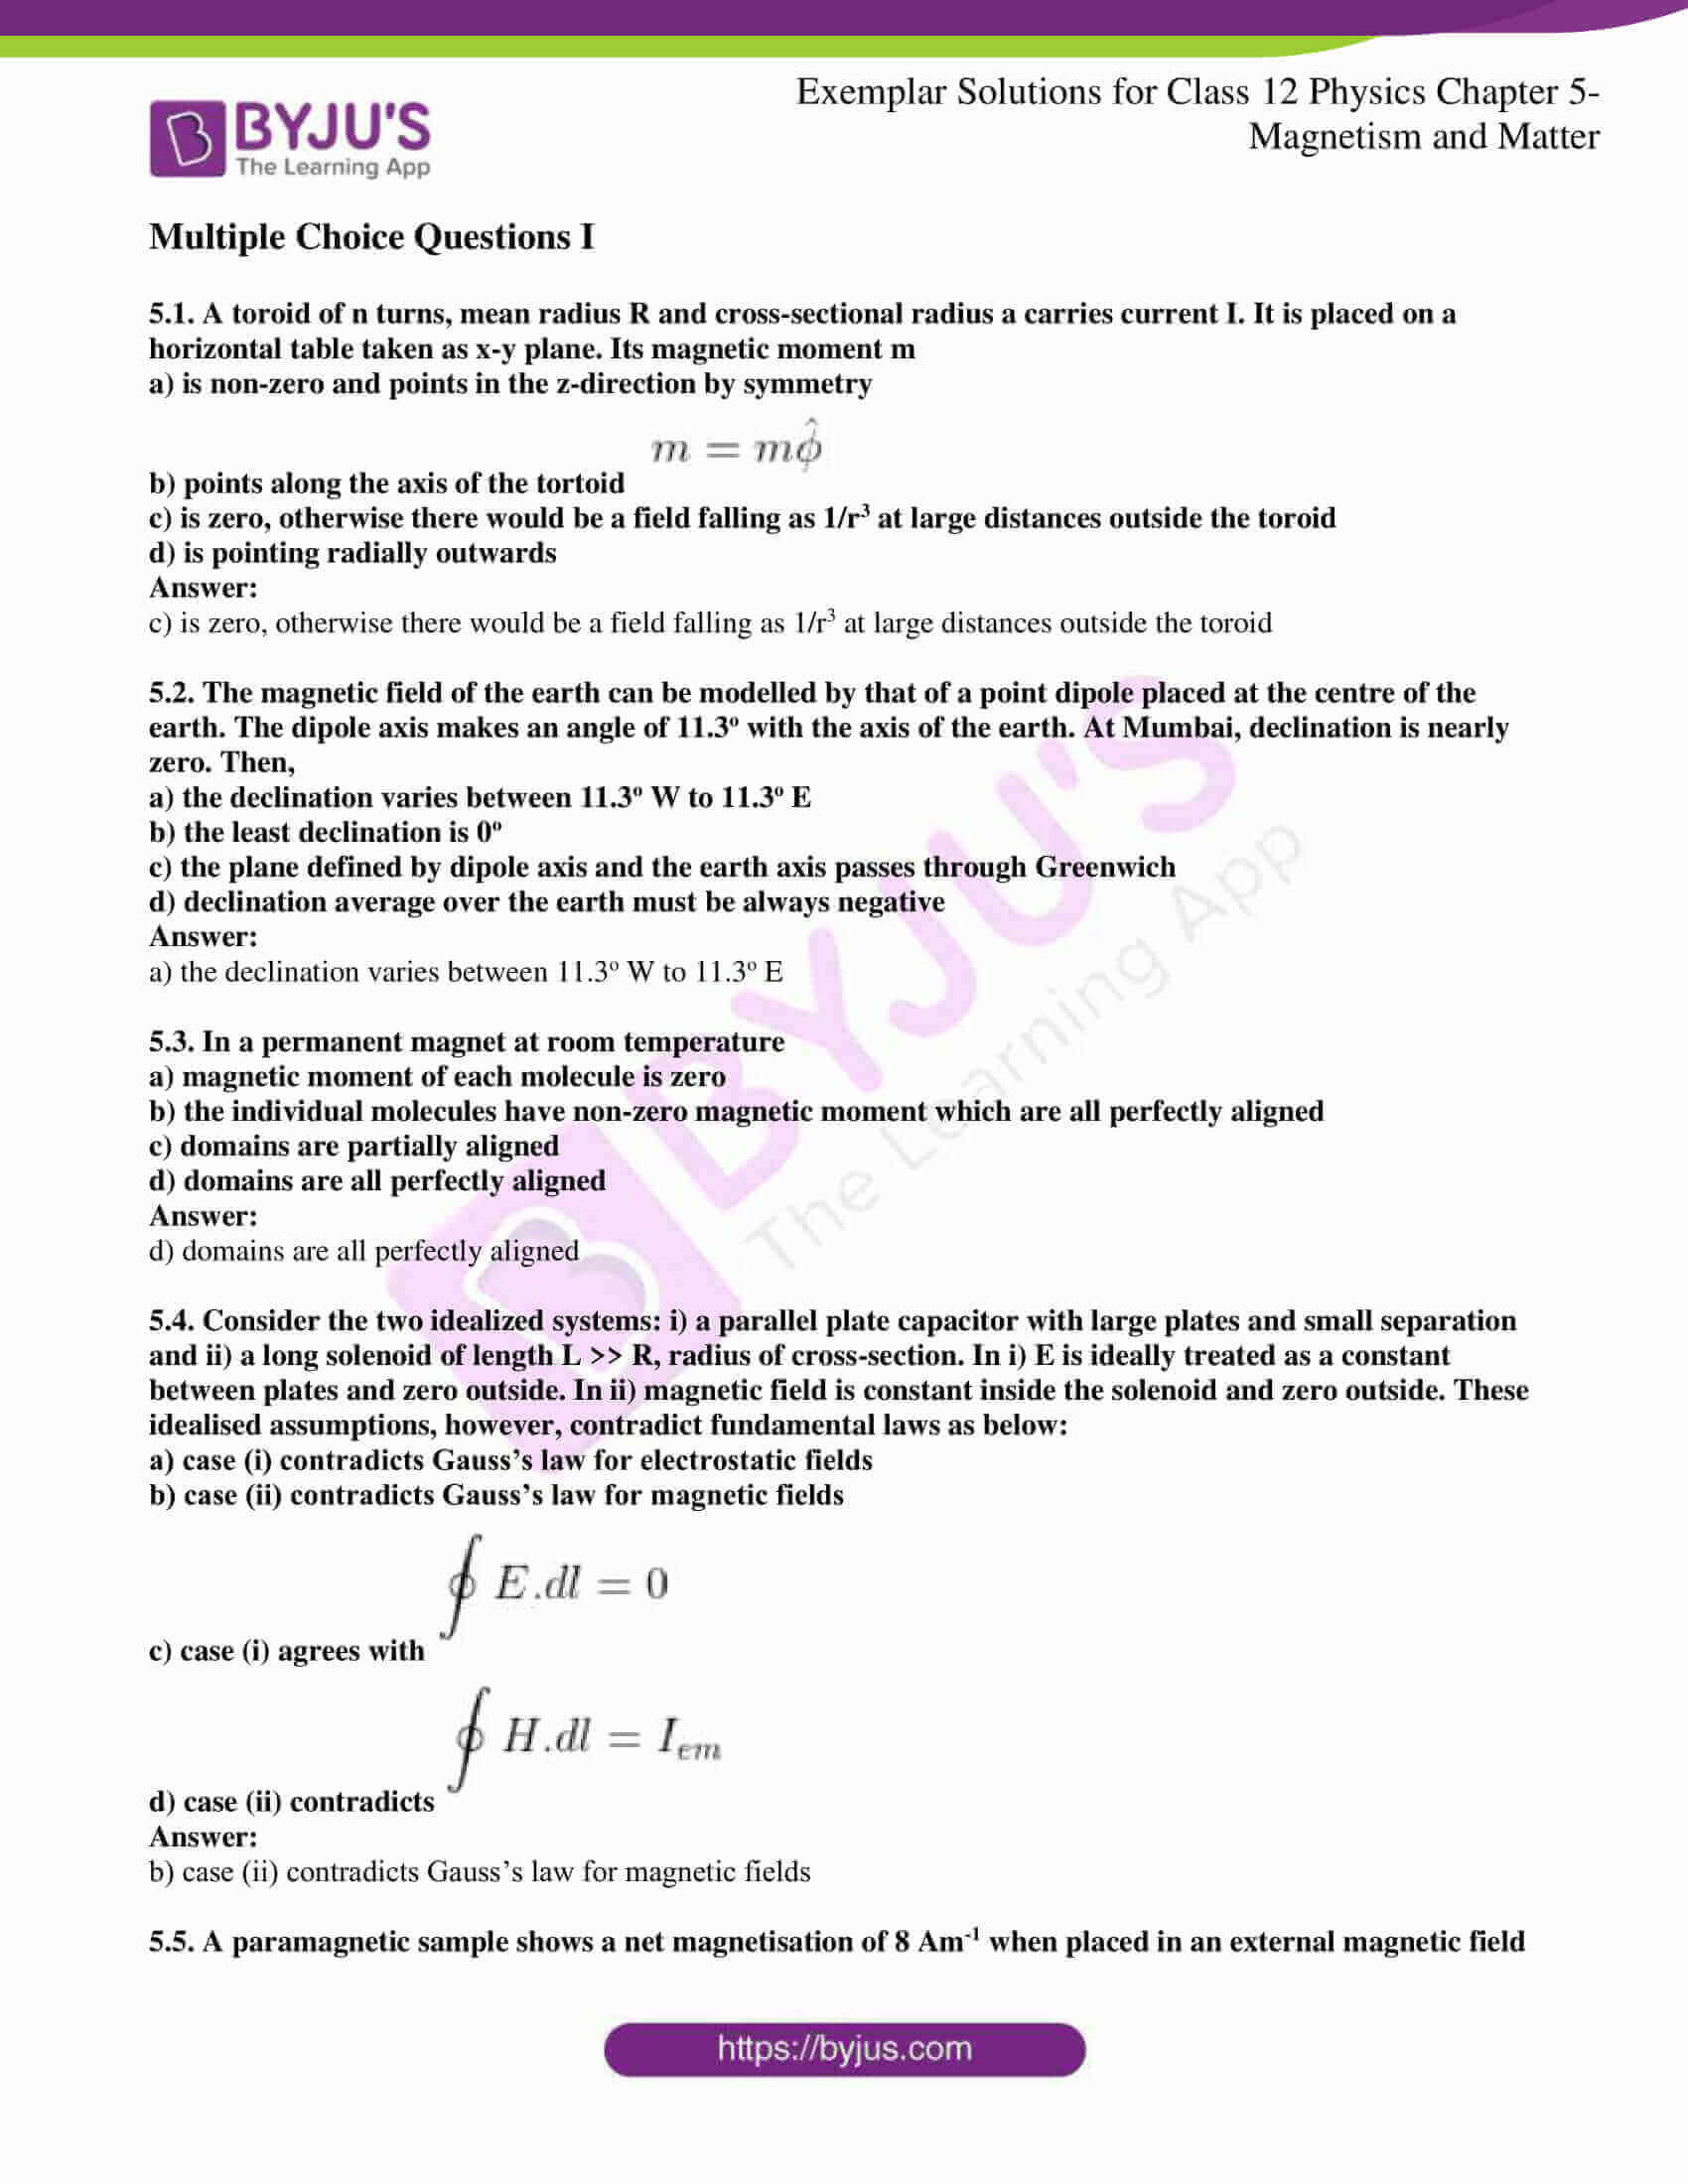 ncert exemplar solutions for class 12 physics chapter 5 01